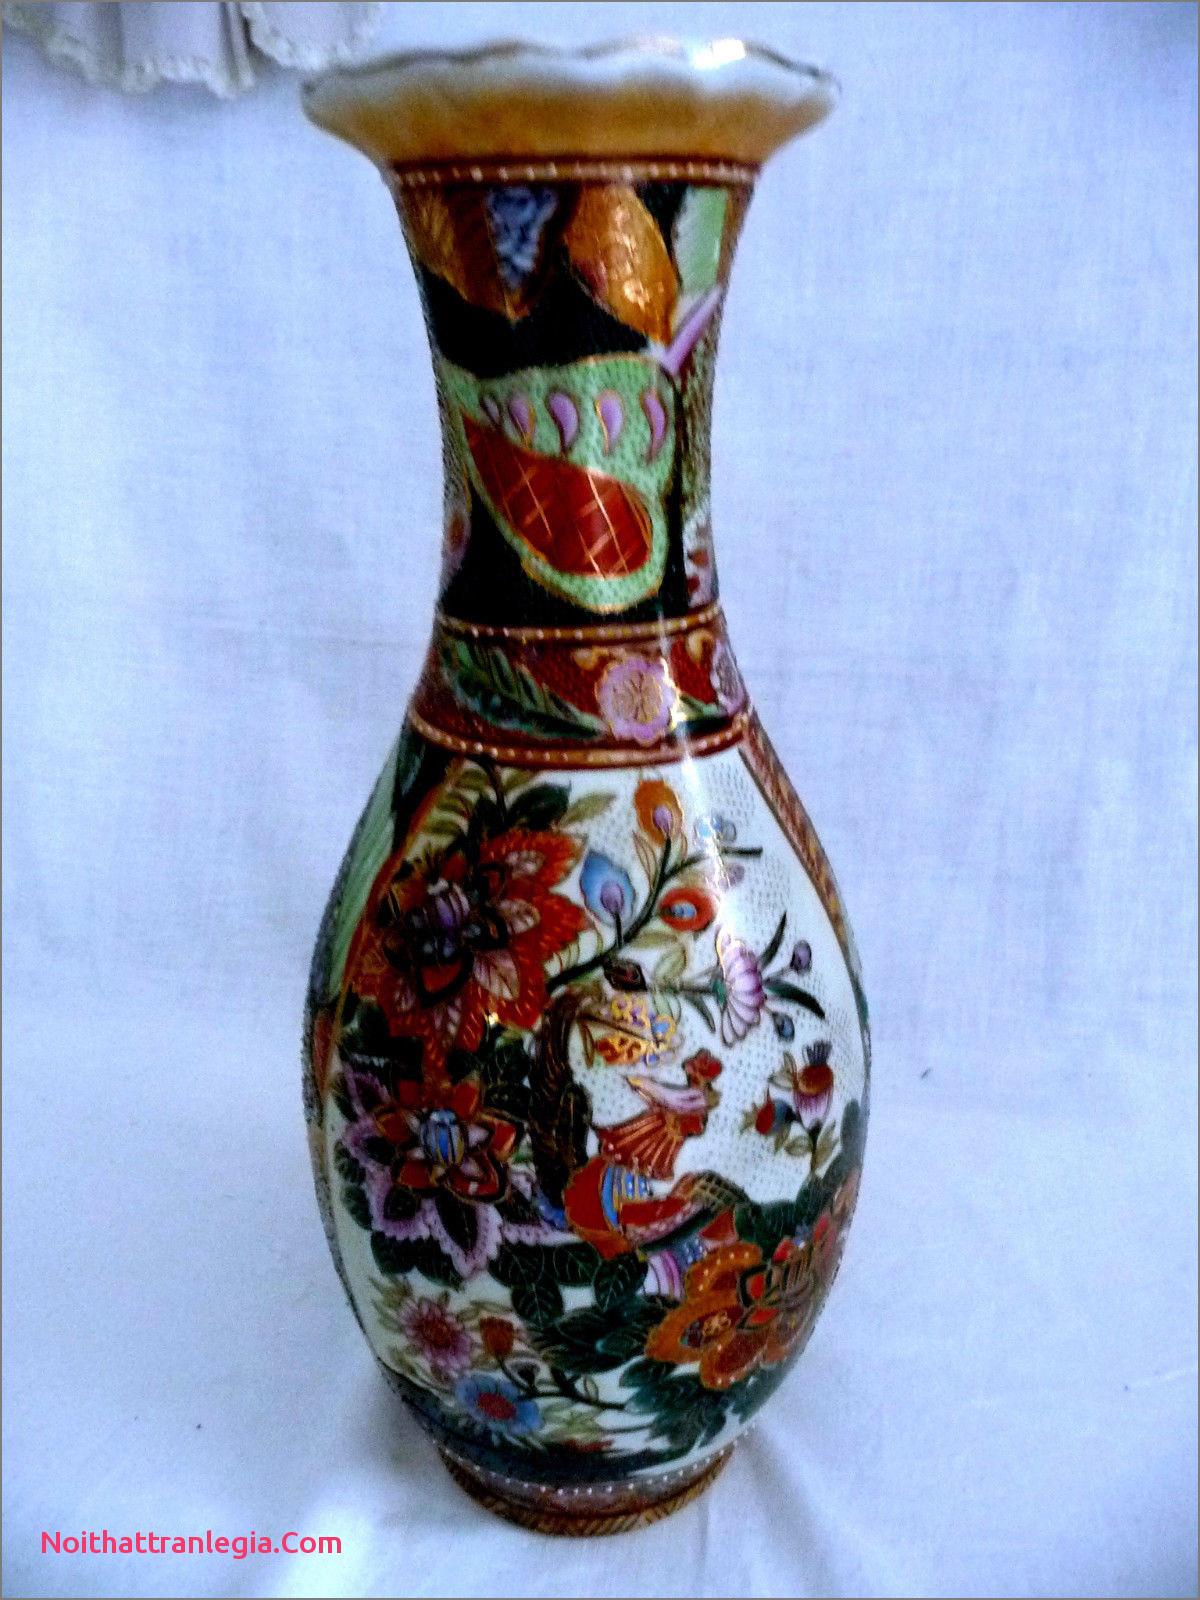 famille rose porcelain vase of 20 chinese antique vase noithattranlegia vases design pertaining to 1 von 11 siehe mehr